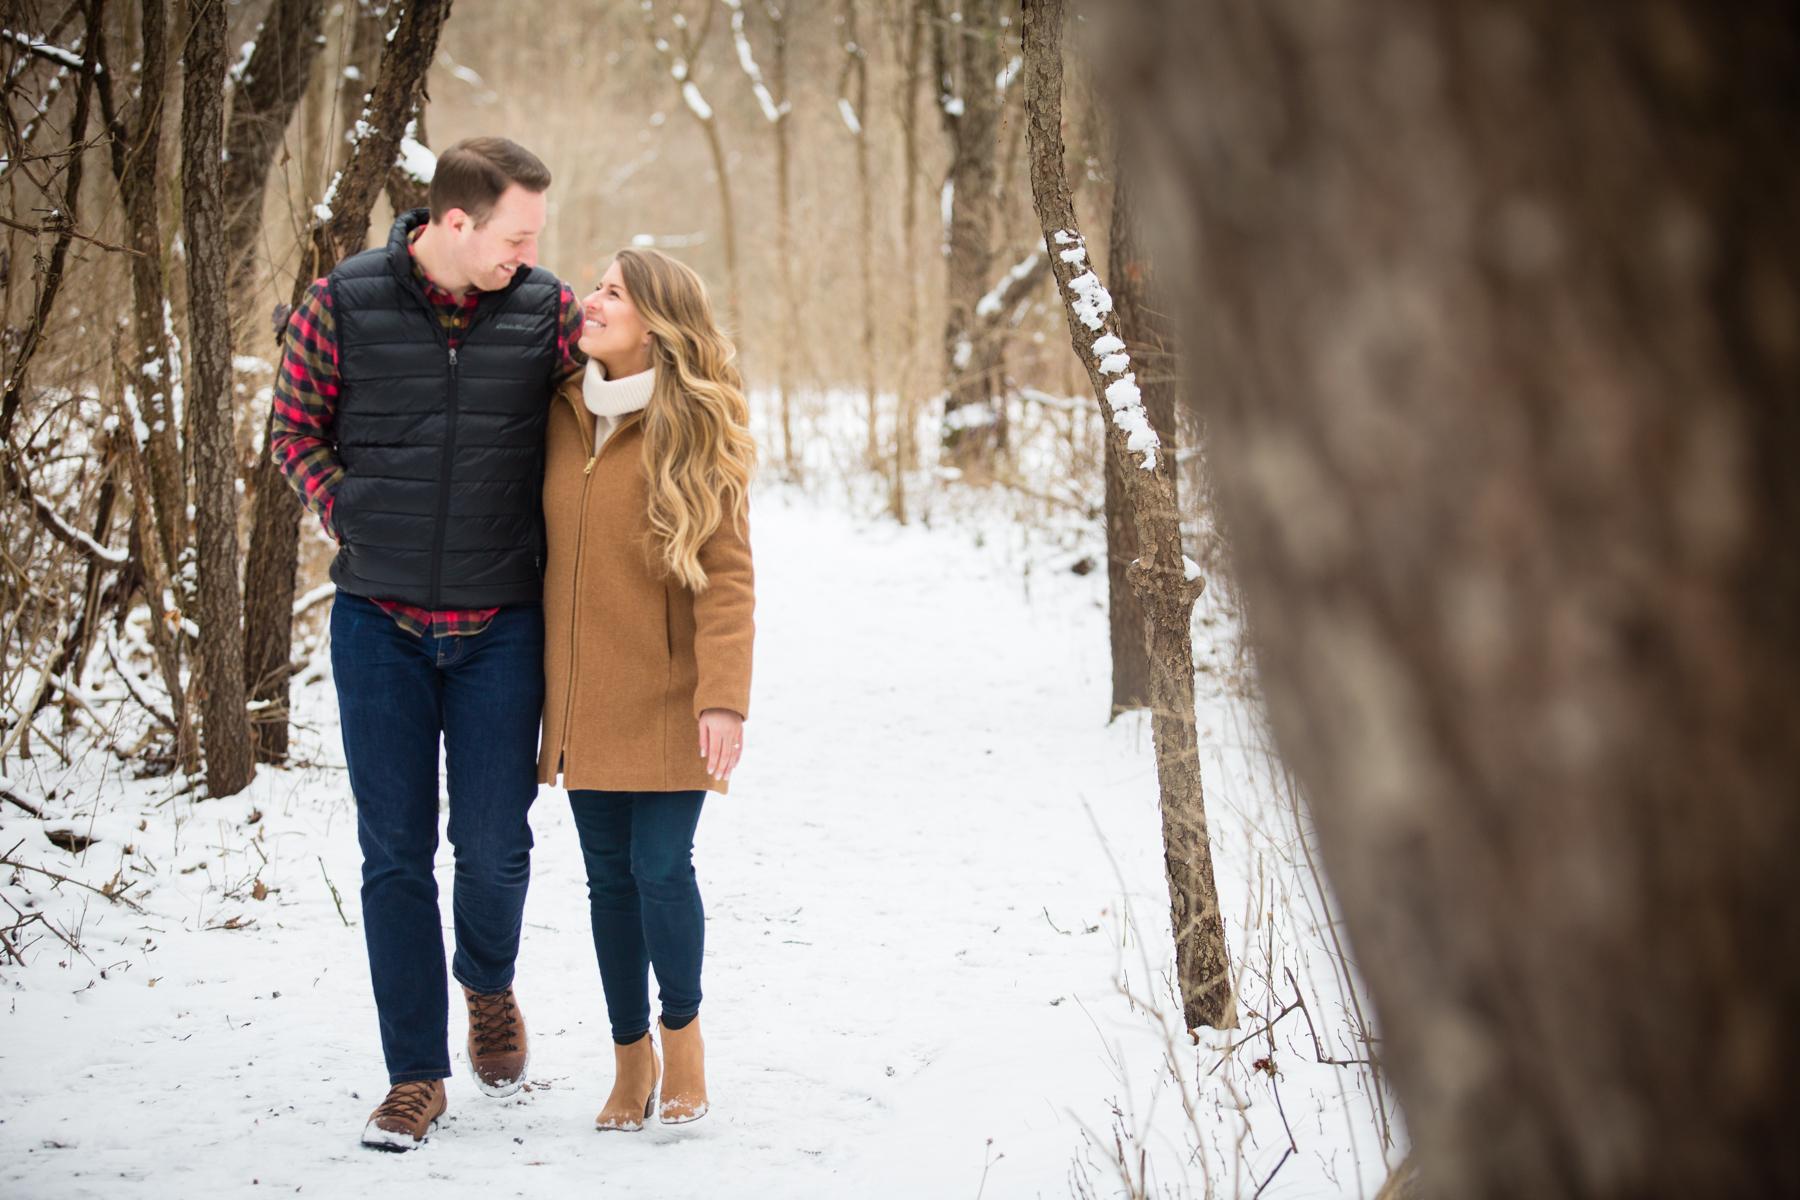 Doug&Kara_winter_Engagment_Photos_Brandon_Shafer_Photography_Blog-4.jpg